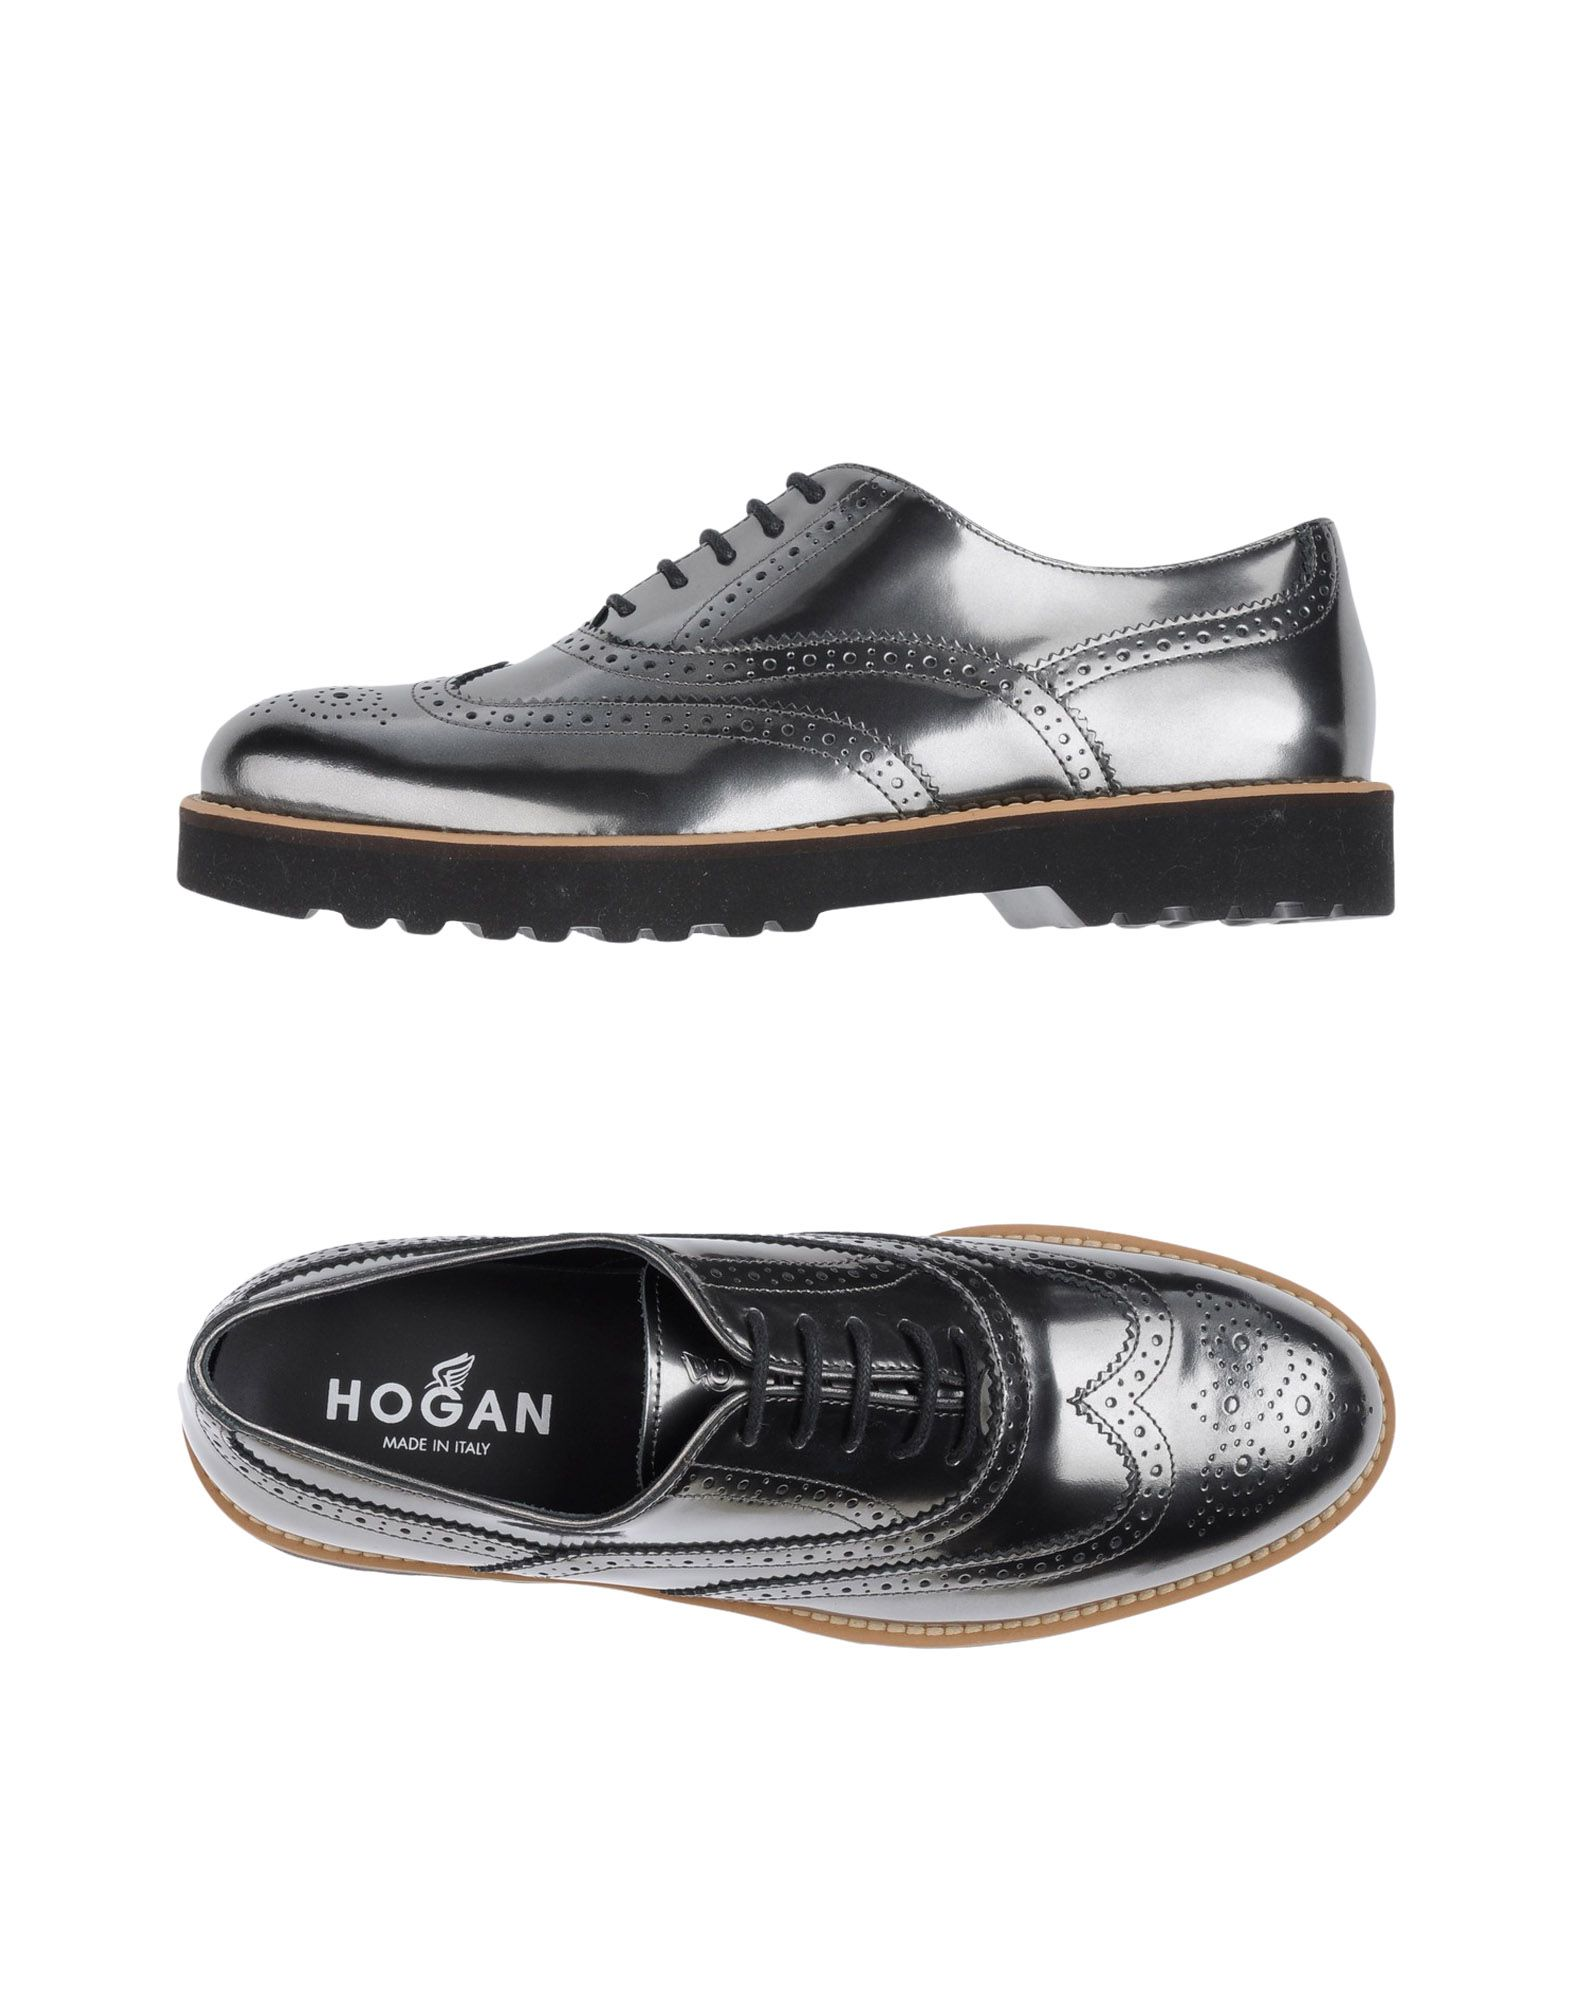 A buon mercato Stringate Hogan Donna - 11244515MB